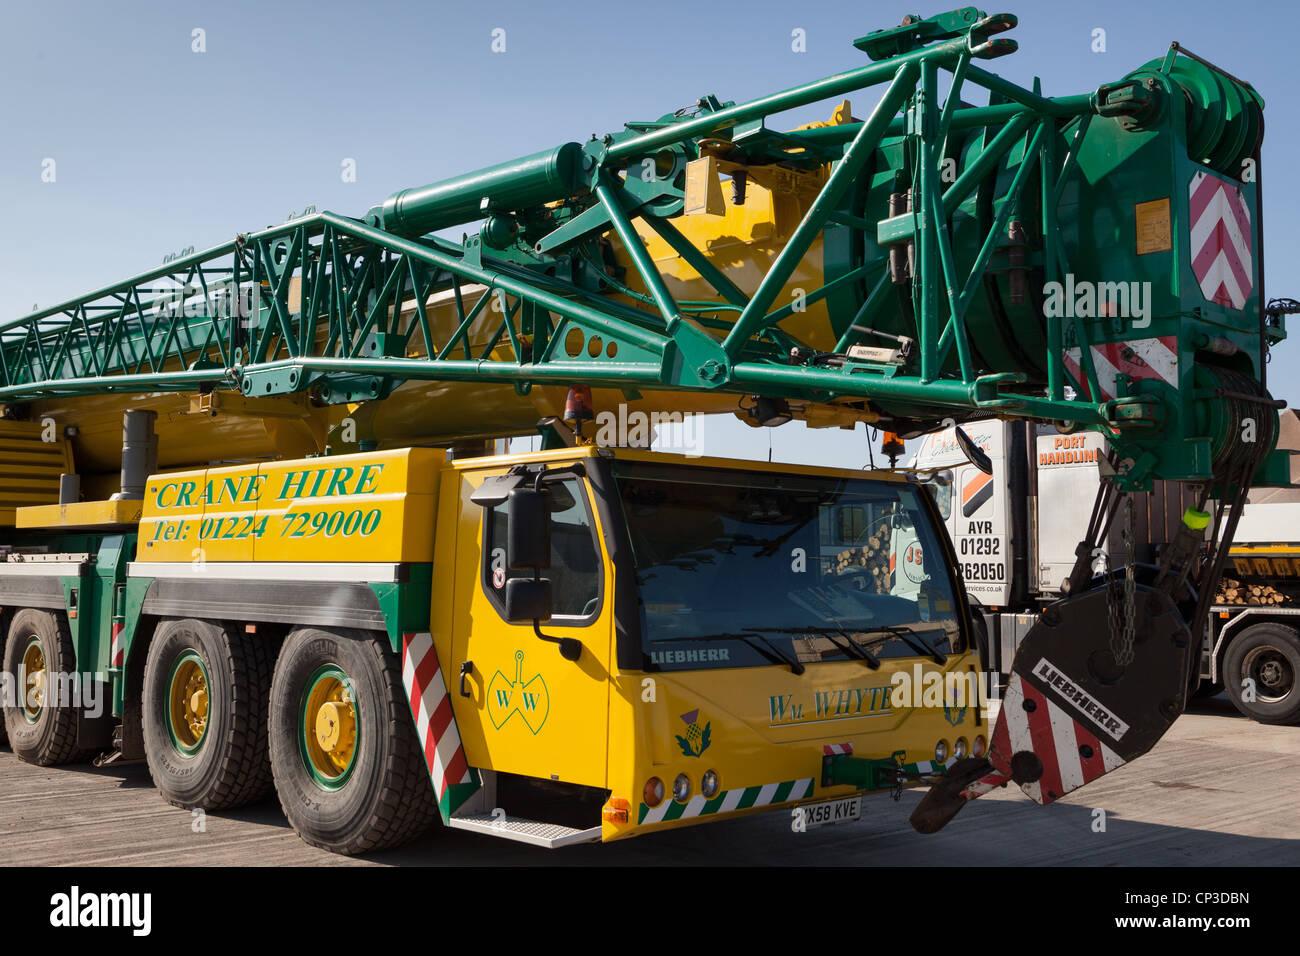 Mobile cranes for cargo handling at Montrose Port Scotland